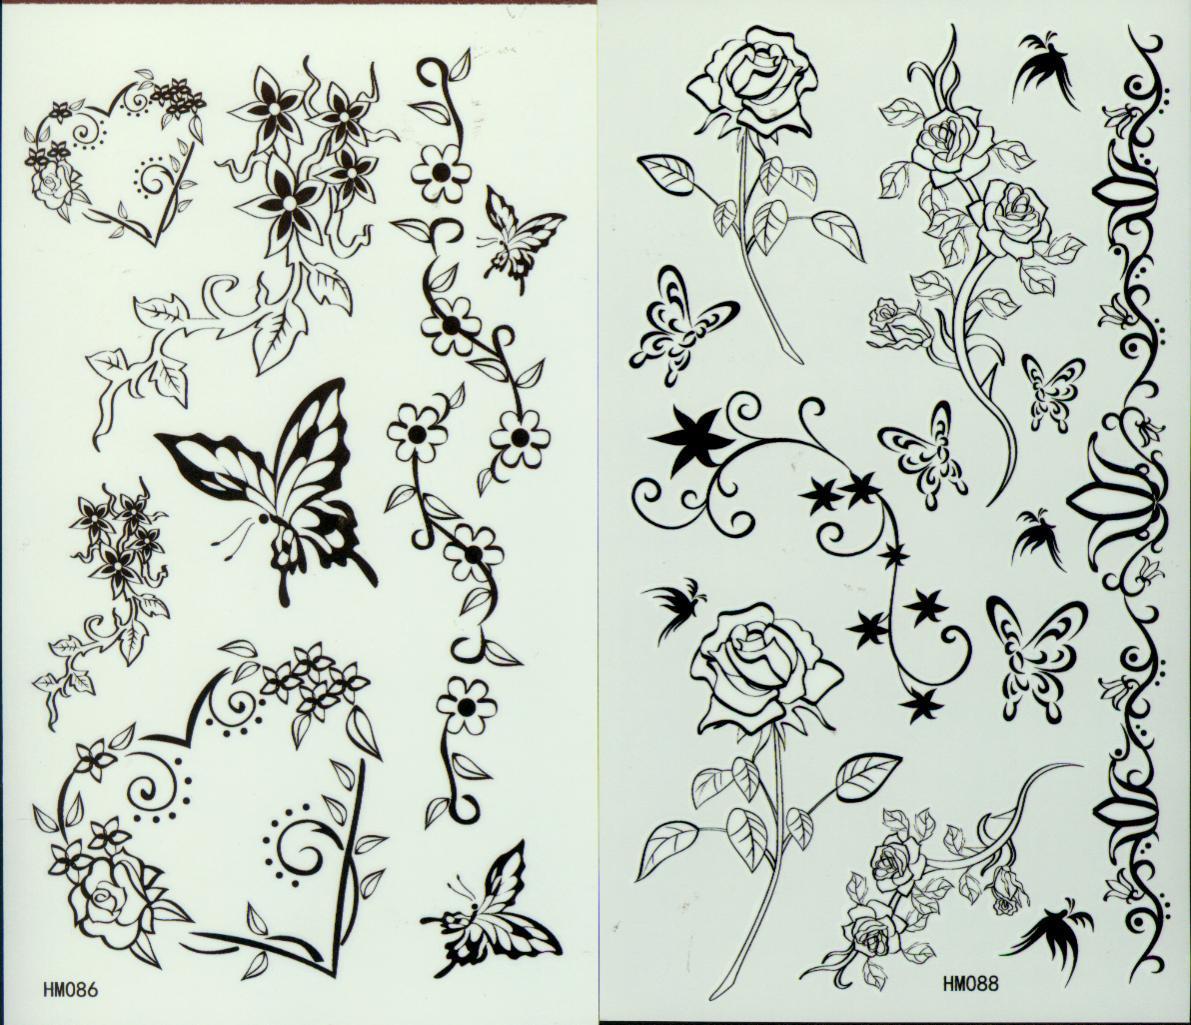 Tatuajes temporales 50 unids / lote Plantillas de Tatuaje de Mariposa Para Cuerpo Impermeable Noticias Tatuajes de Mariposas 206 * 105 mm